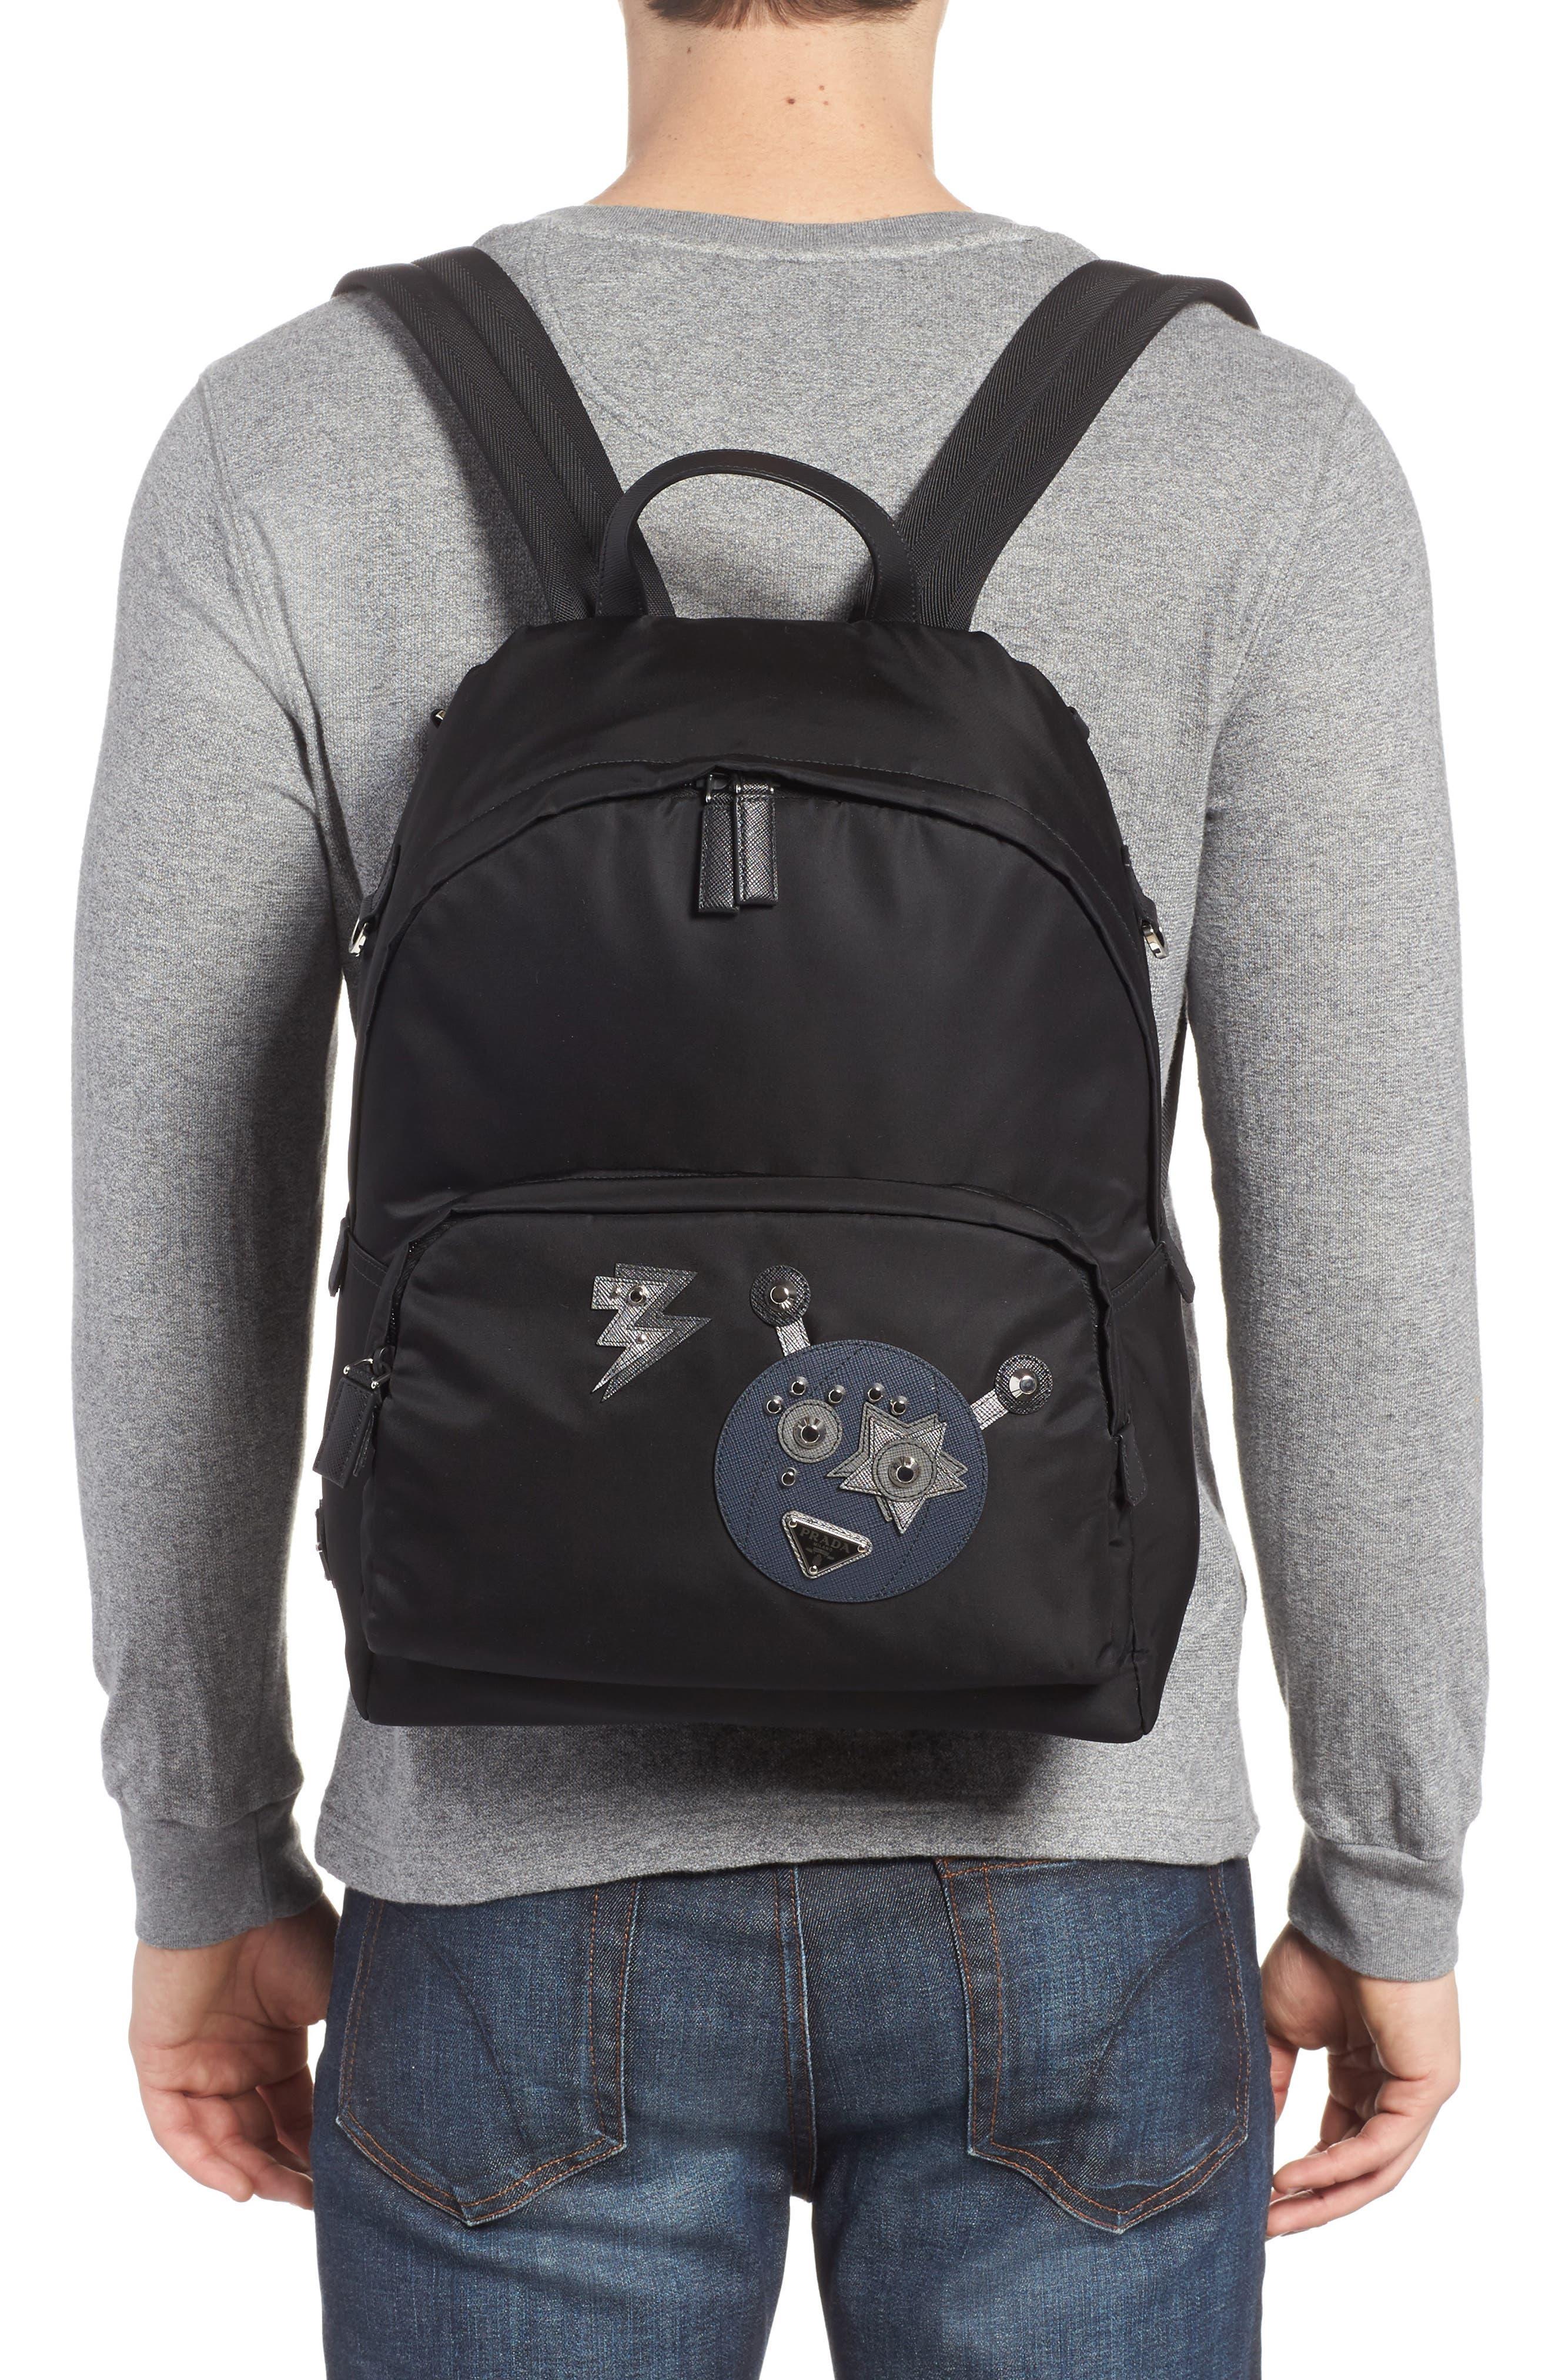 Robot Backpack,                             Alternate thumbnail 2, color,                             F0g52 Nero+Baltic